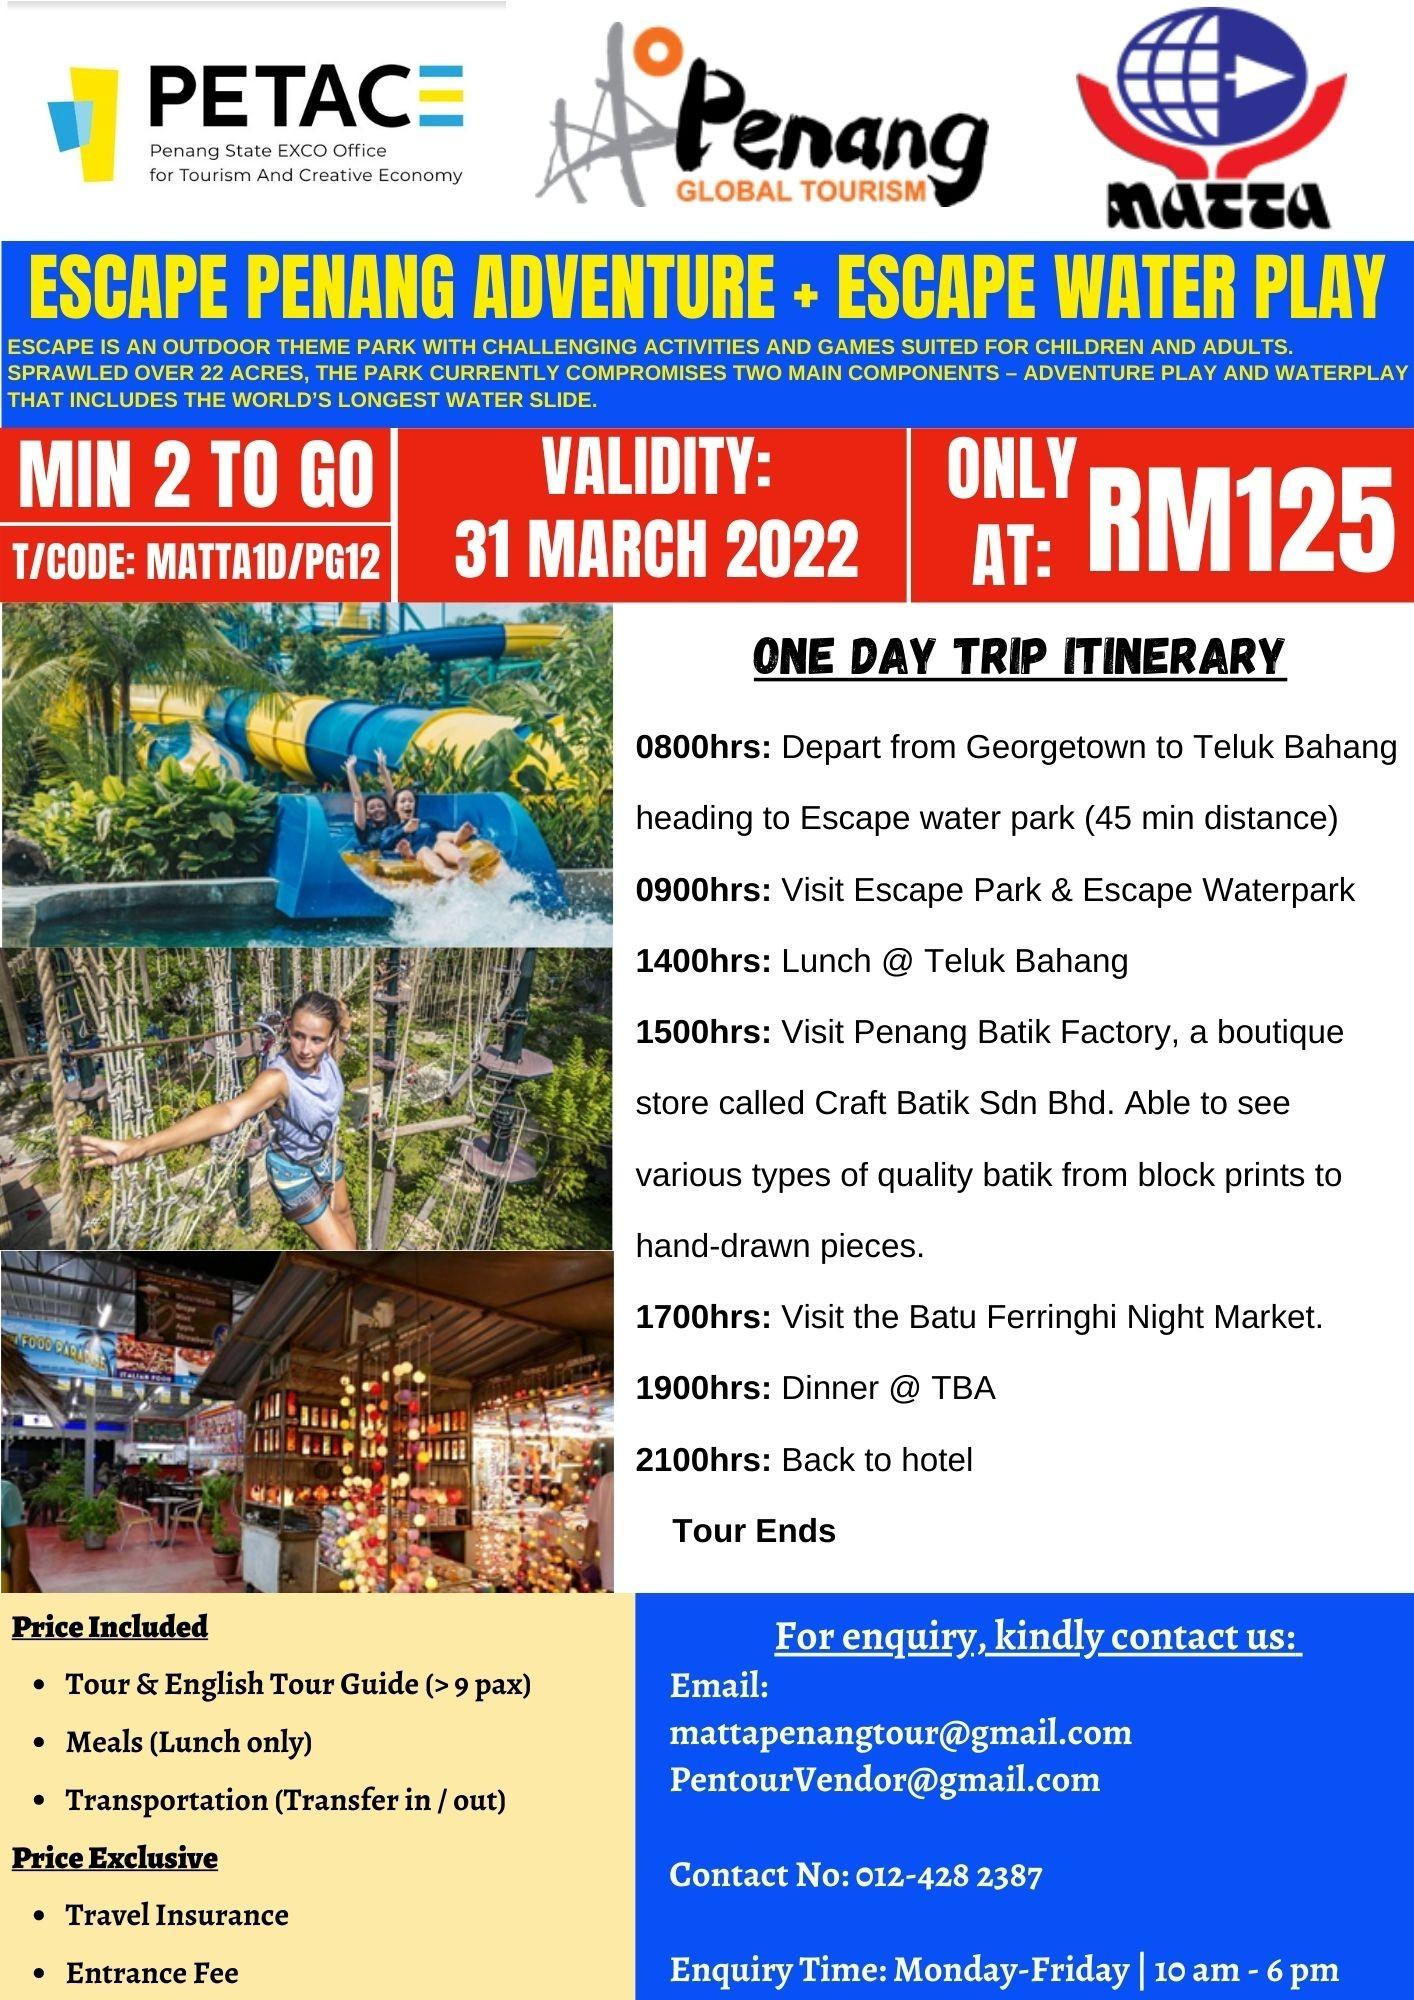 Escape Penang Adventure + Escape Water Play